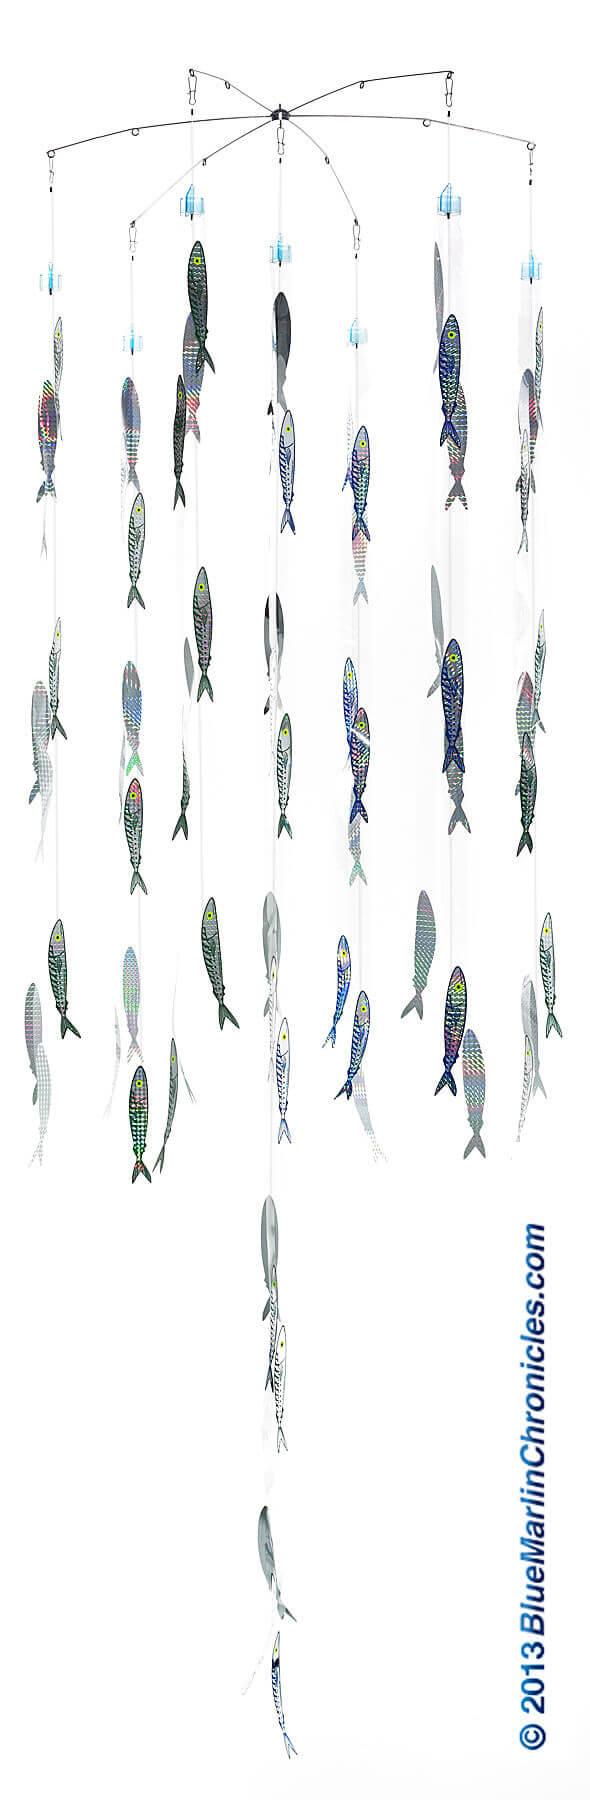 69 Fish Holographic Sardine - Threadfin Dredge